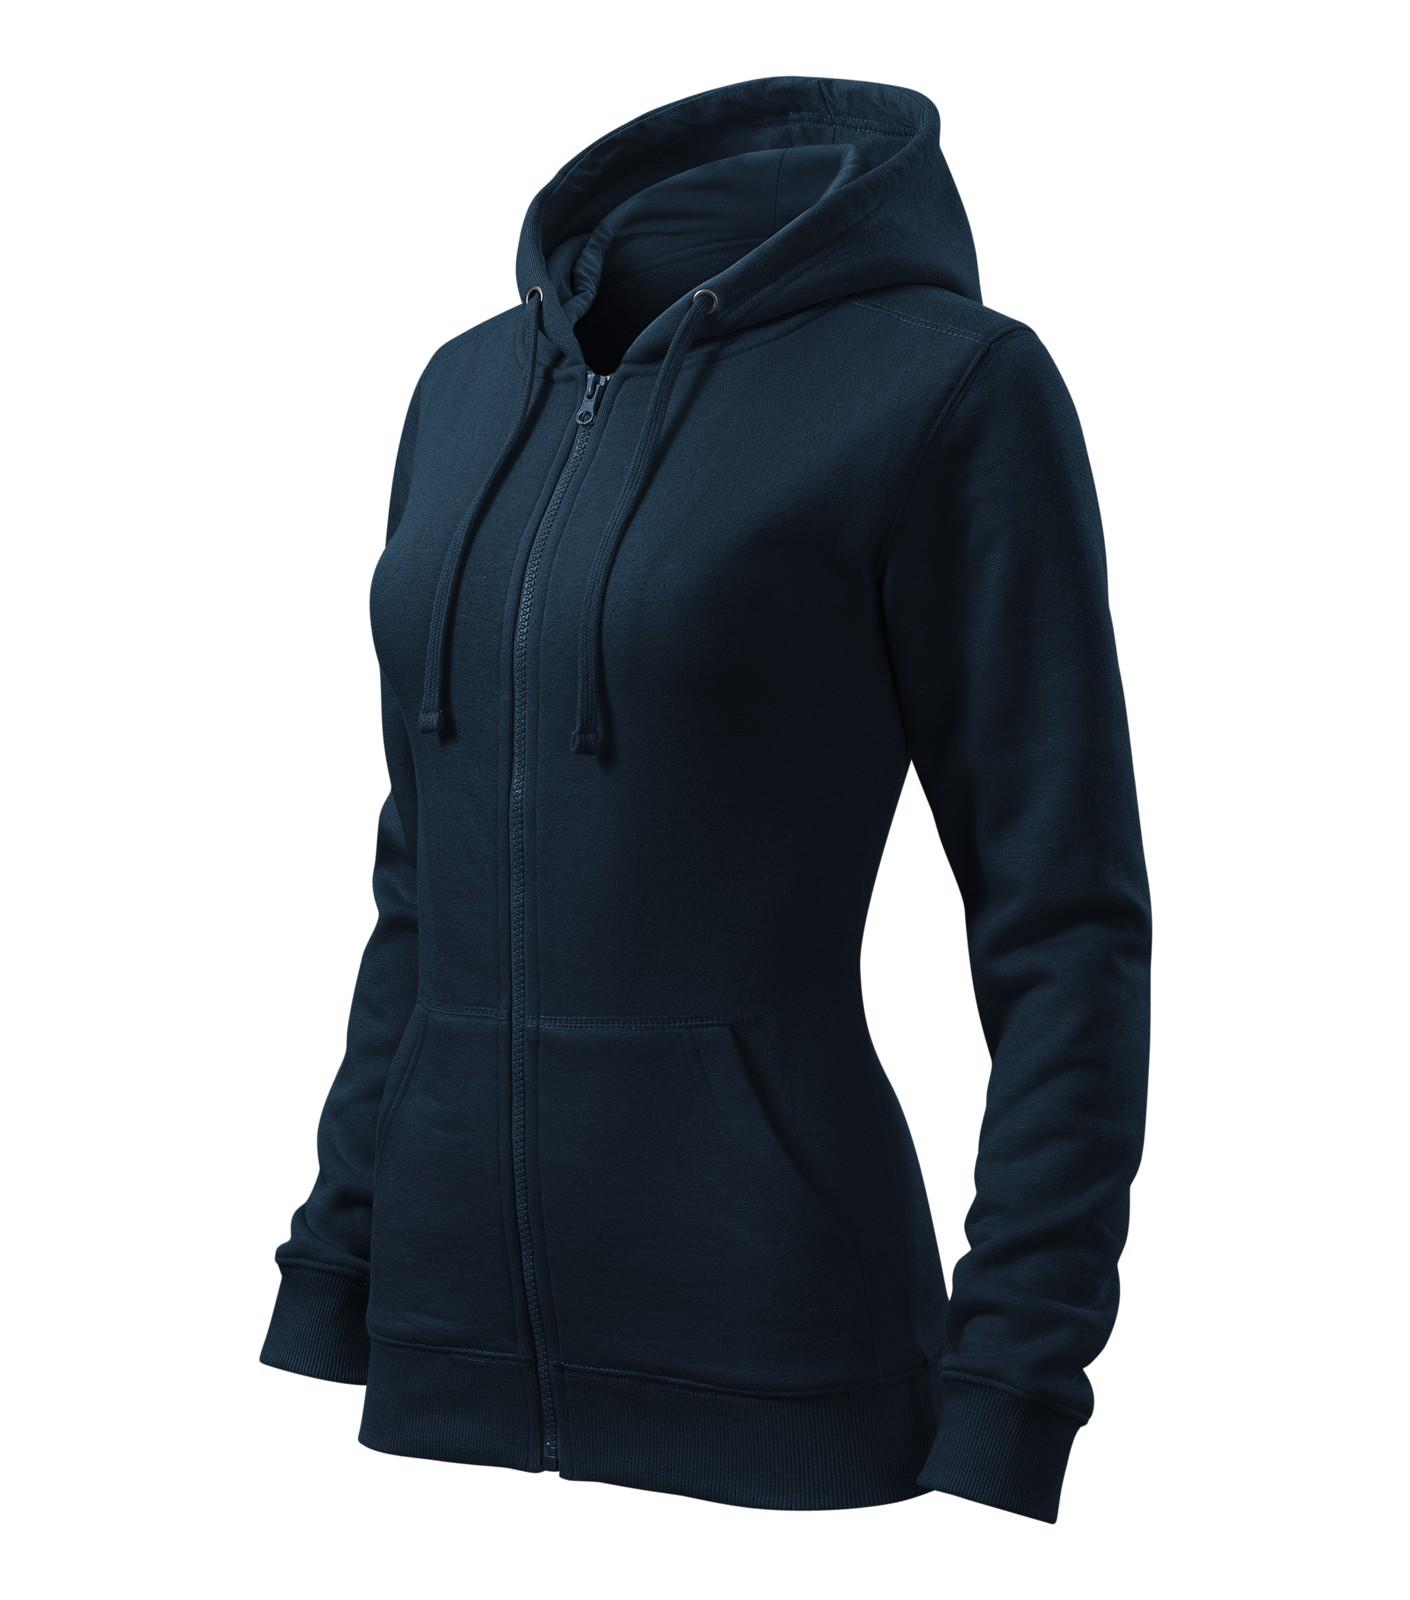 Sweatshirt women's Malfini Trendy Zipper - Navy Blue / XL